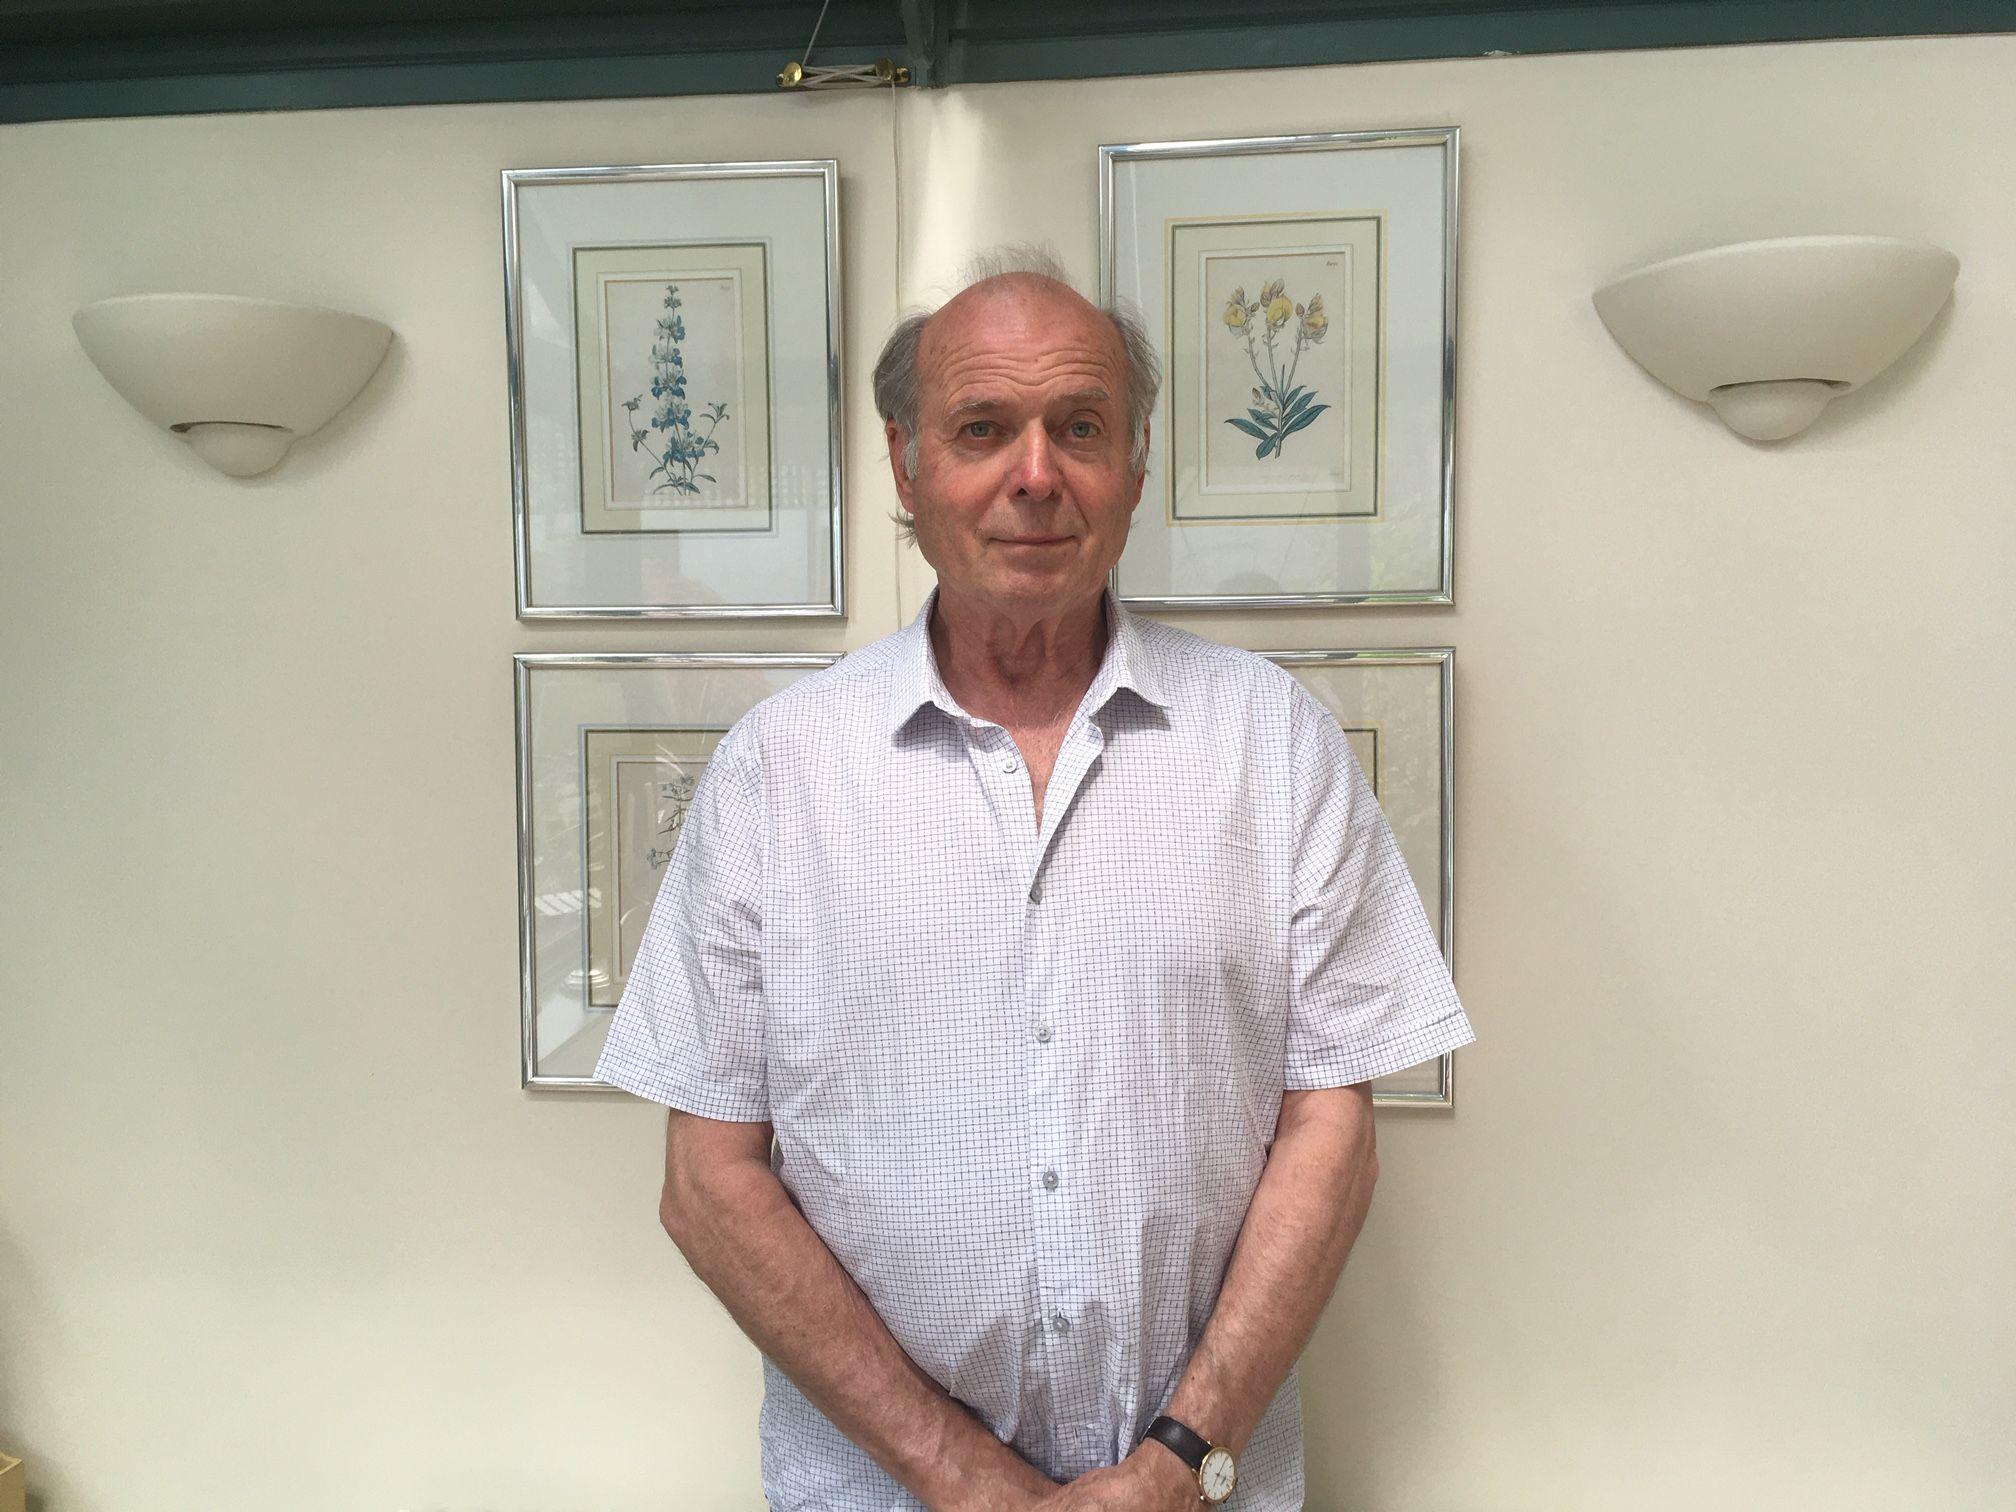 Master David Blunt